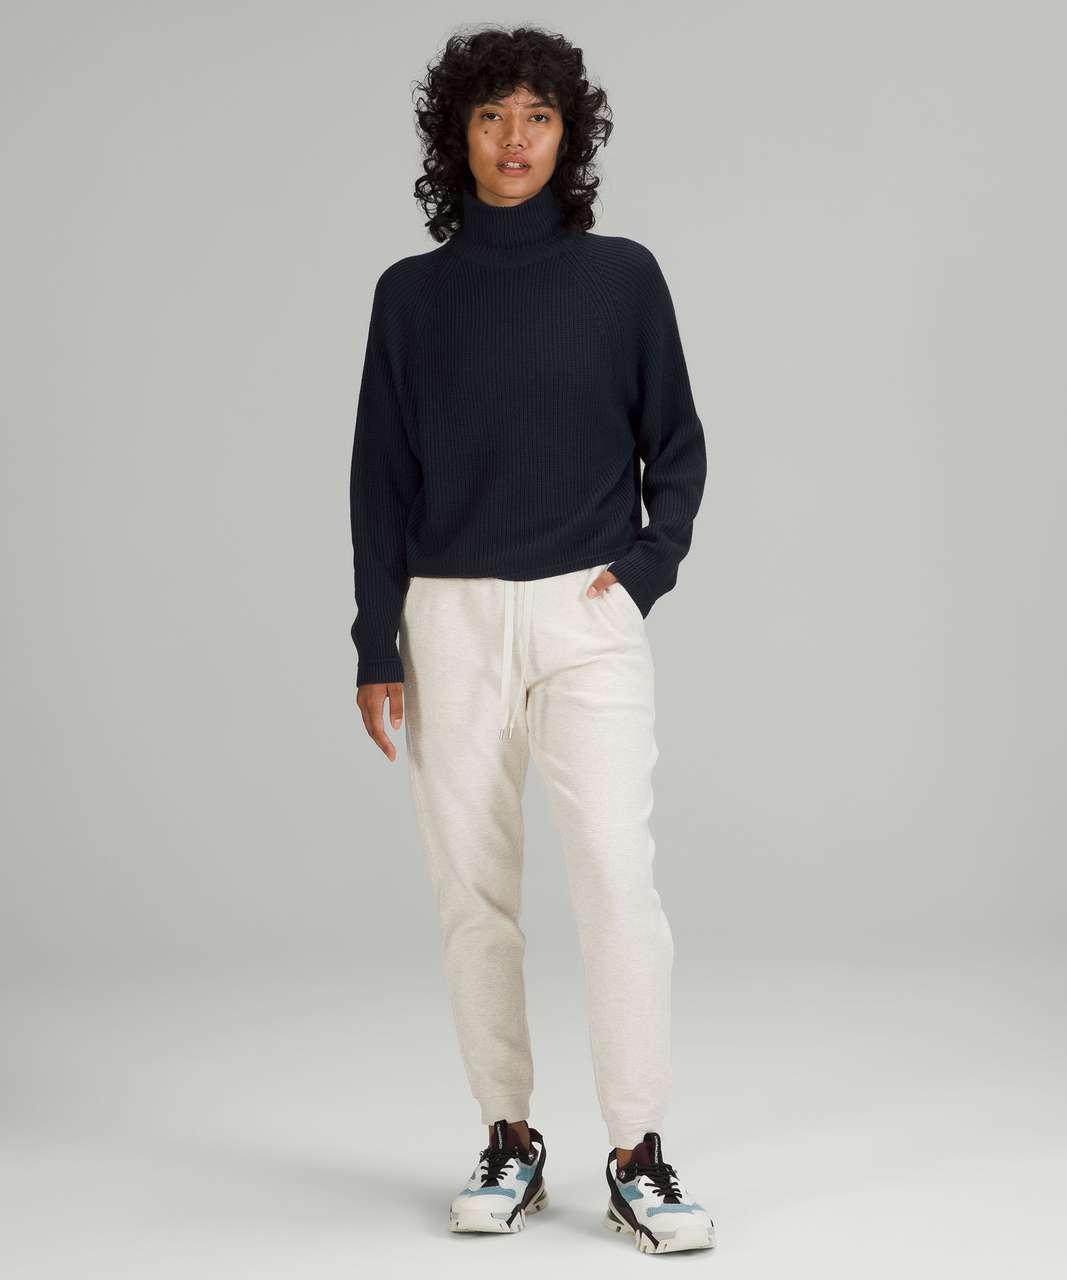 Lululemon Ribbed Turtleneck Sweater - True Navy